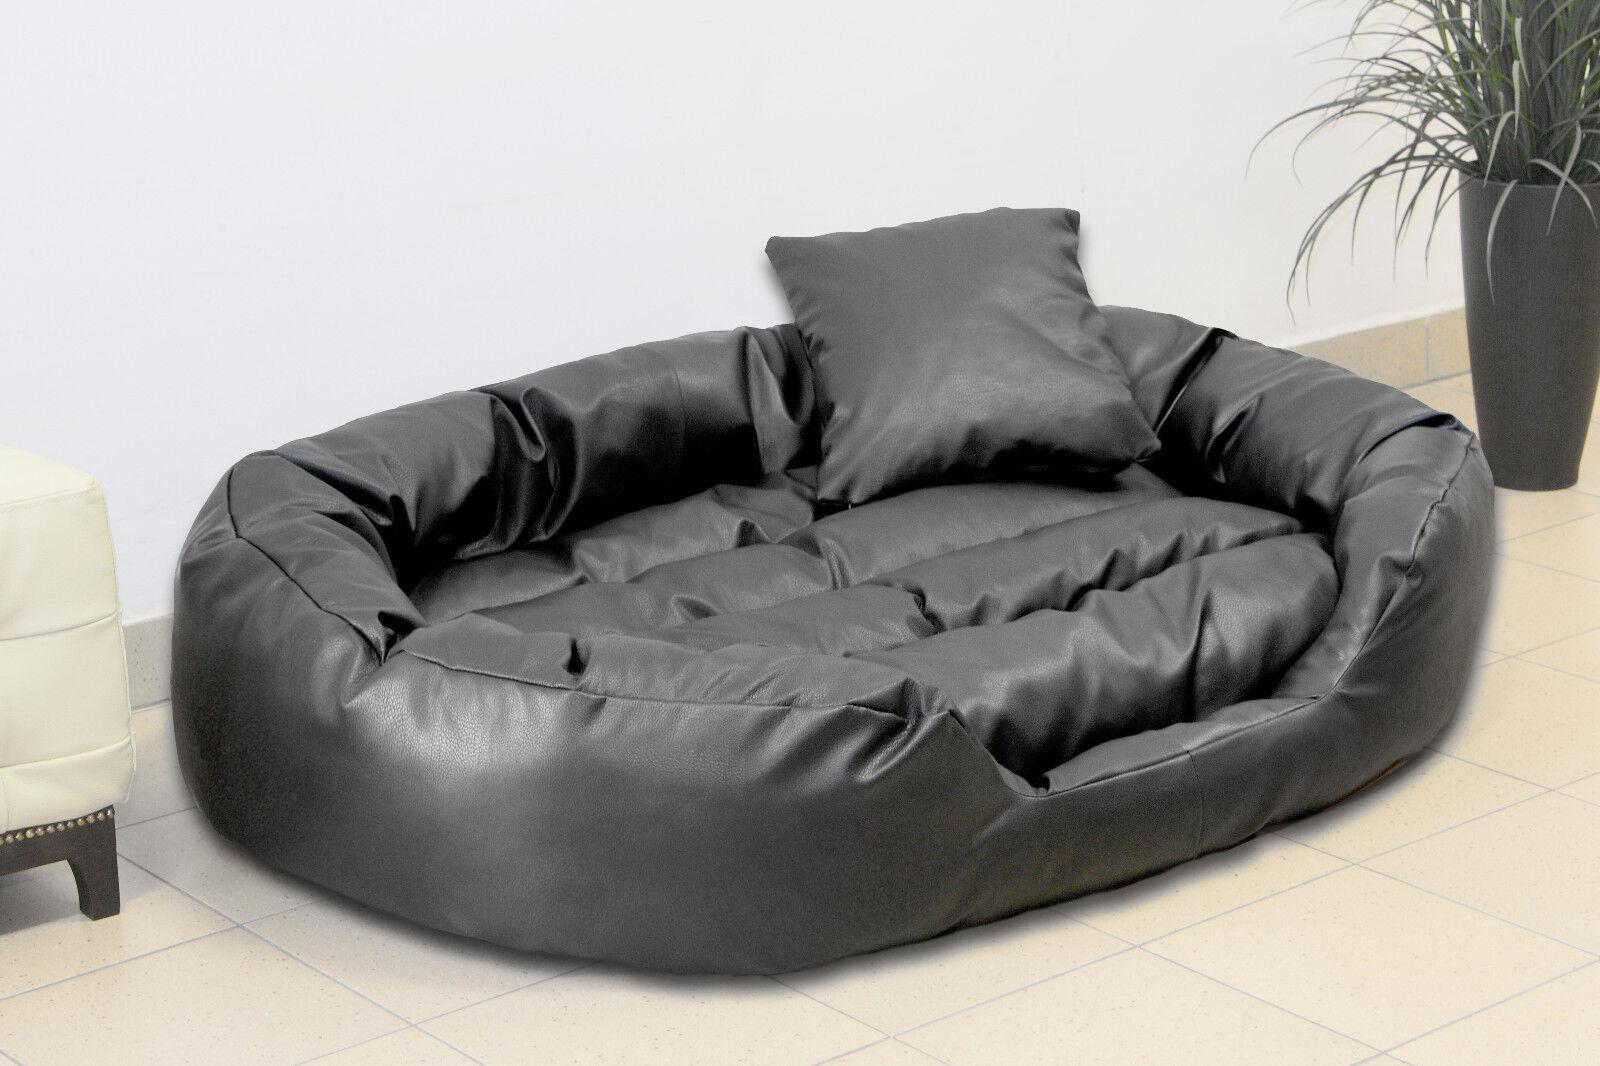 Tierlando ® Cuccia Philip Anti Capelli ECOPELLE 110 140 170 cm XL XXL XXXL